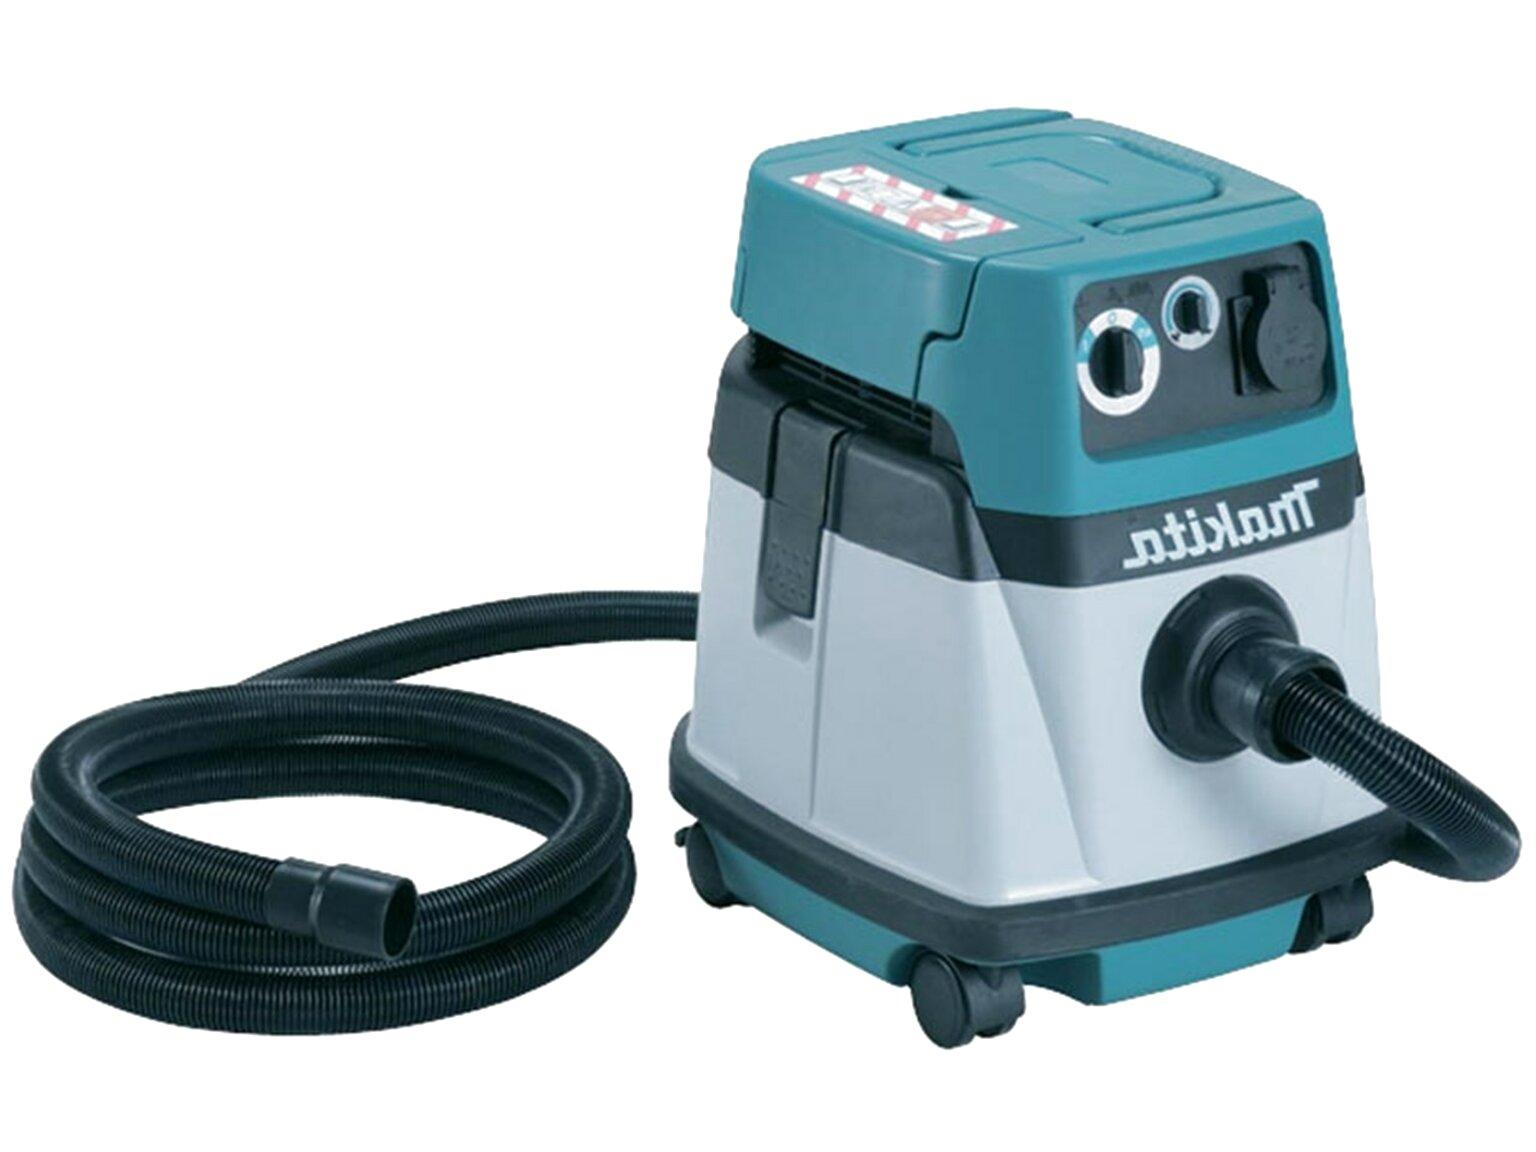 110v vacuum for sale